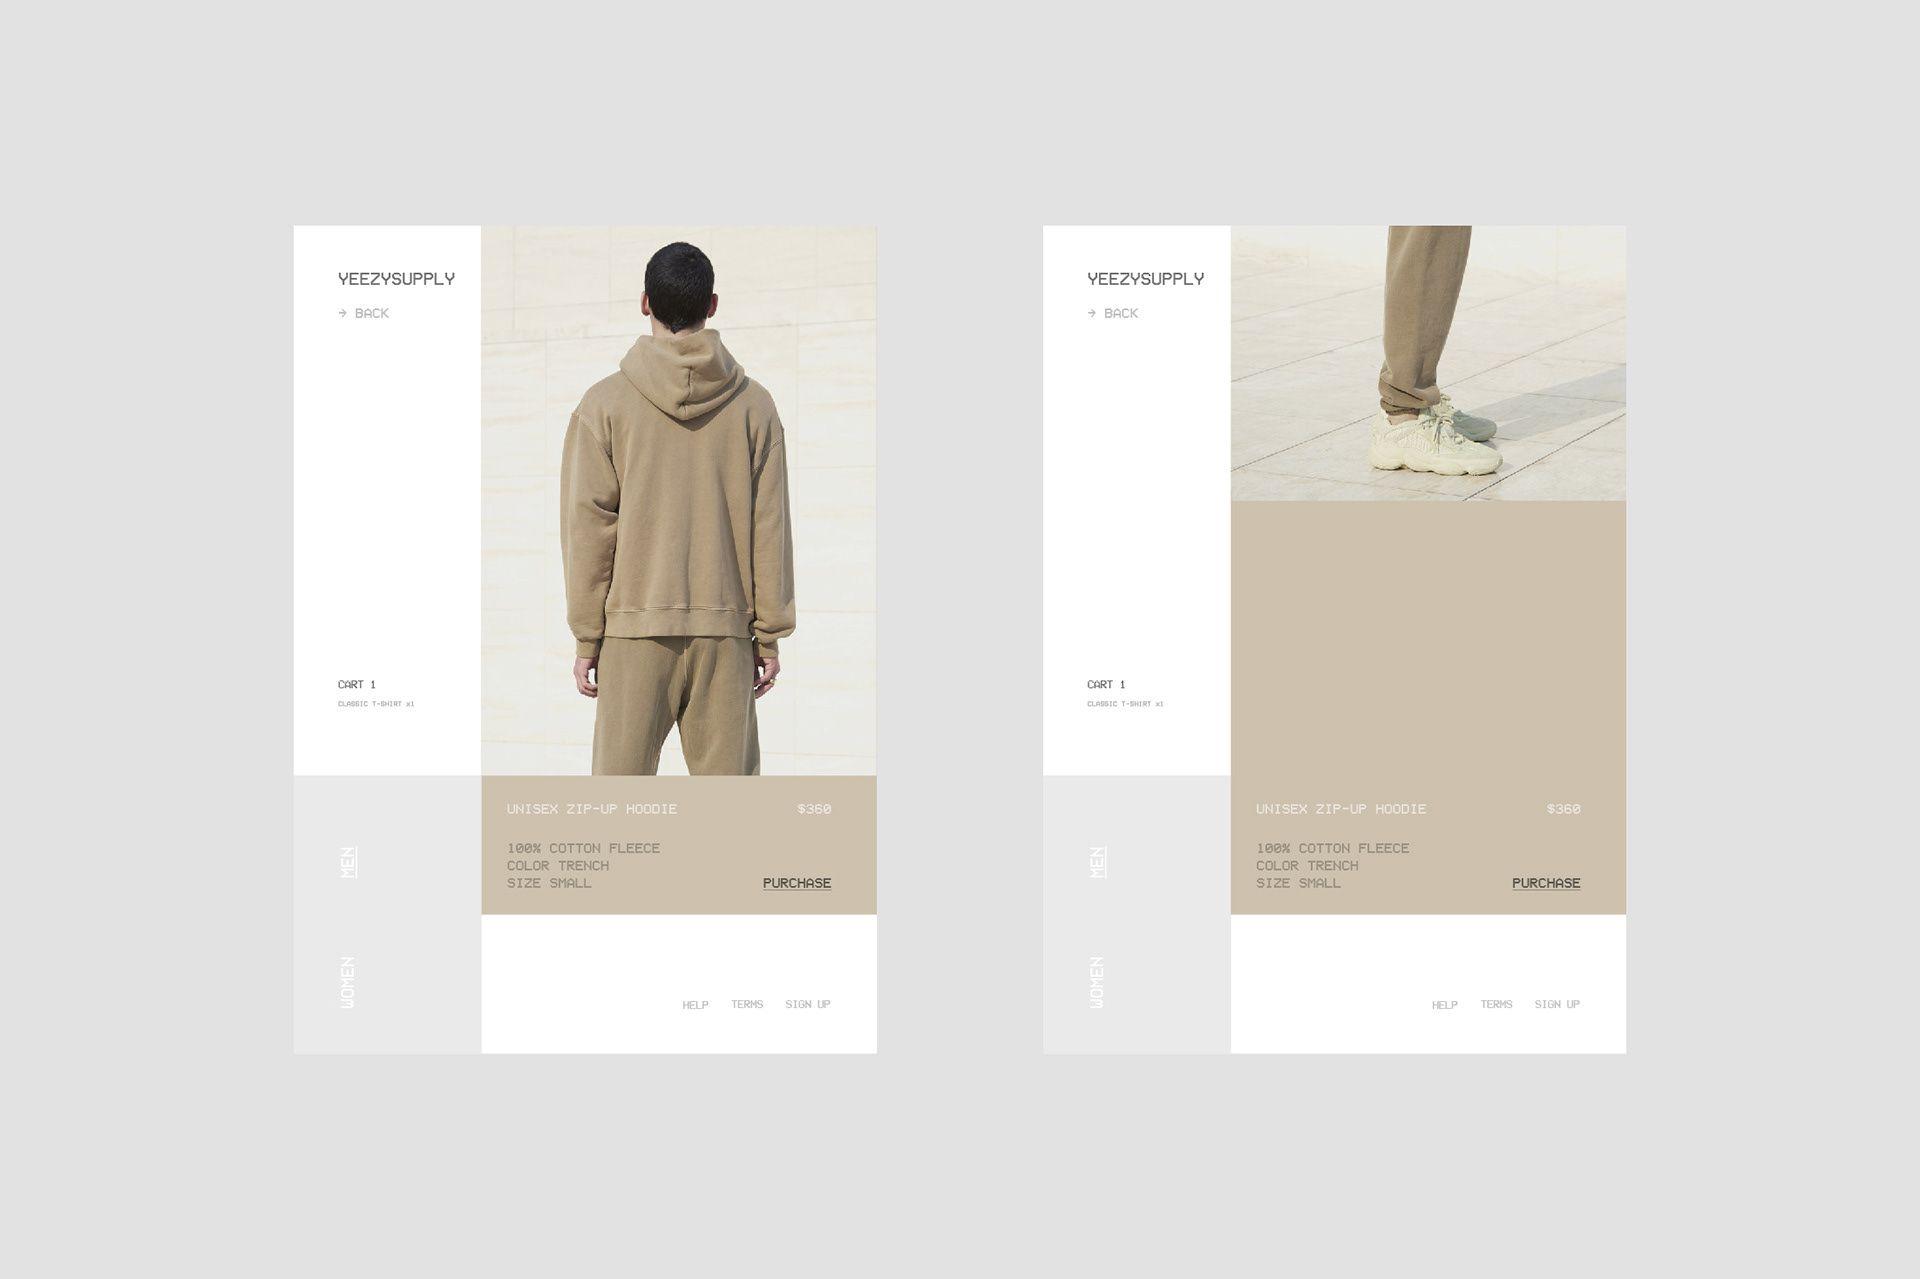 Yeezy Supply - Web Design on Behance